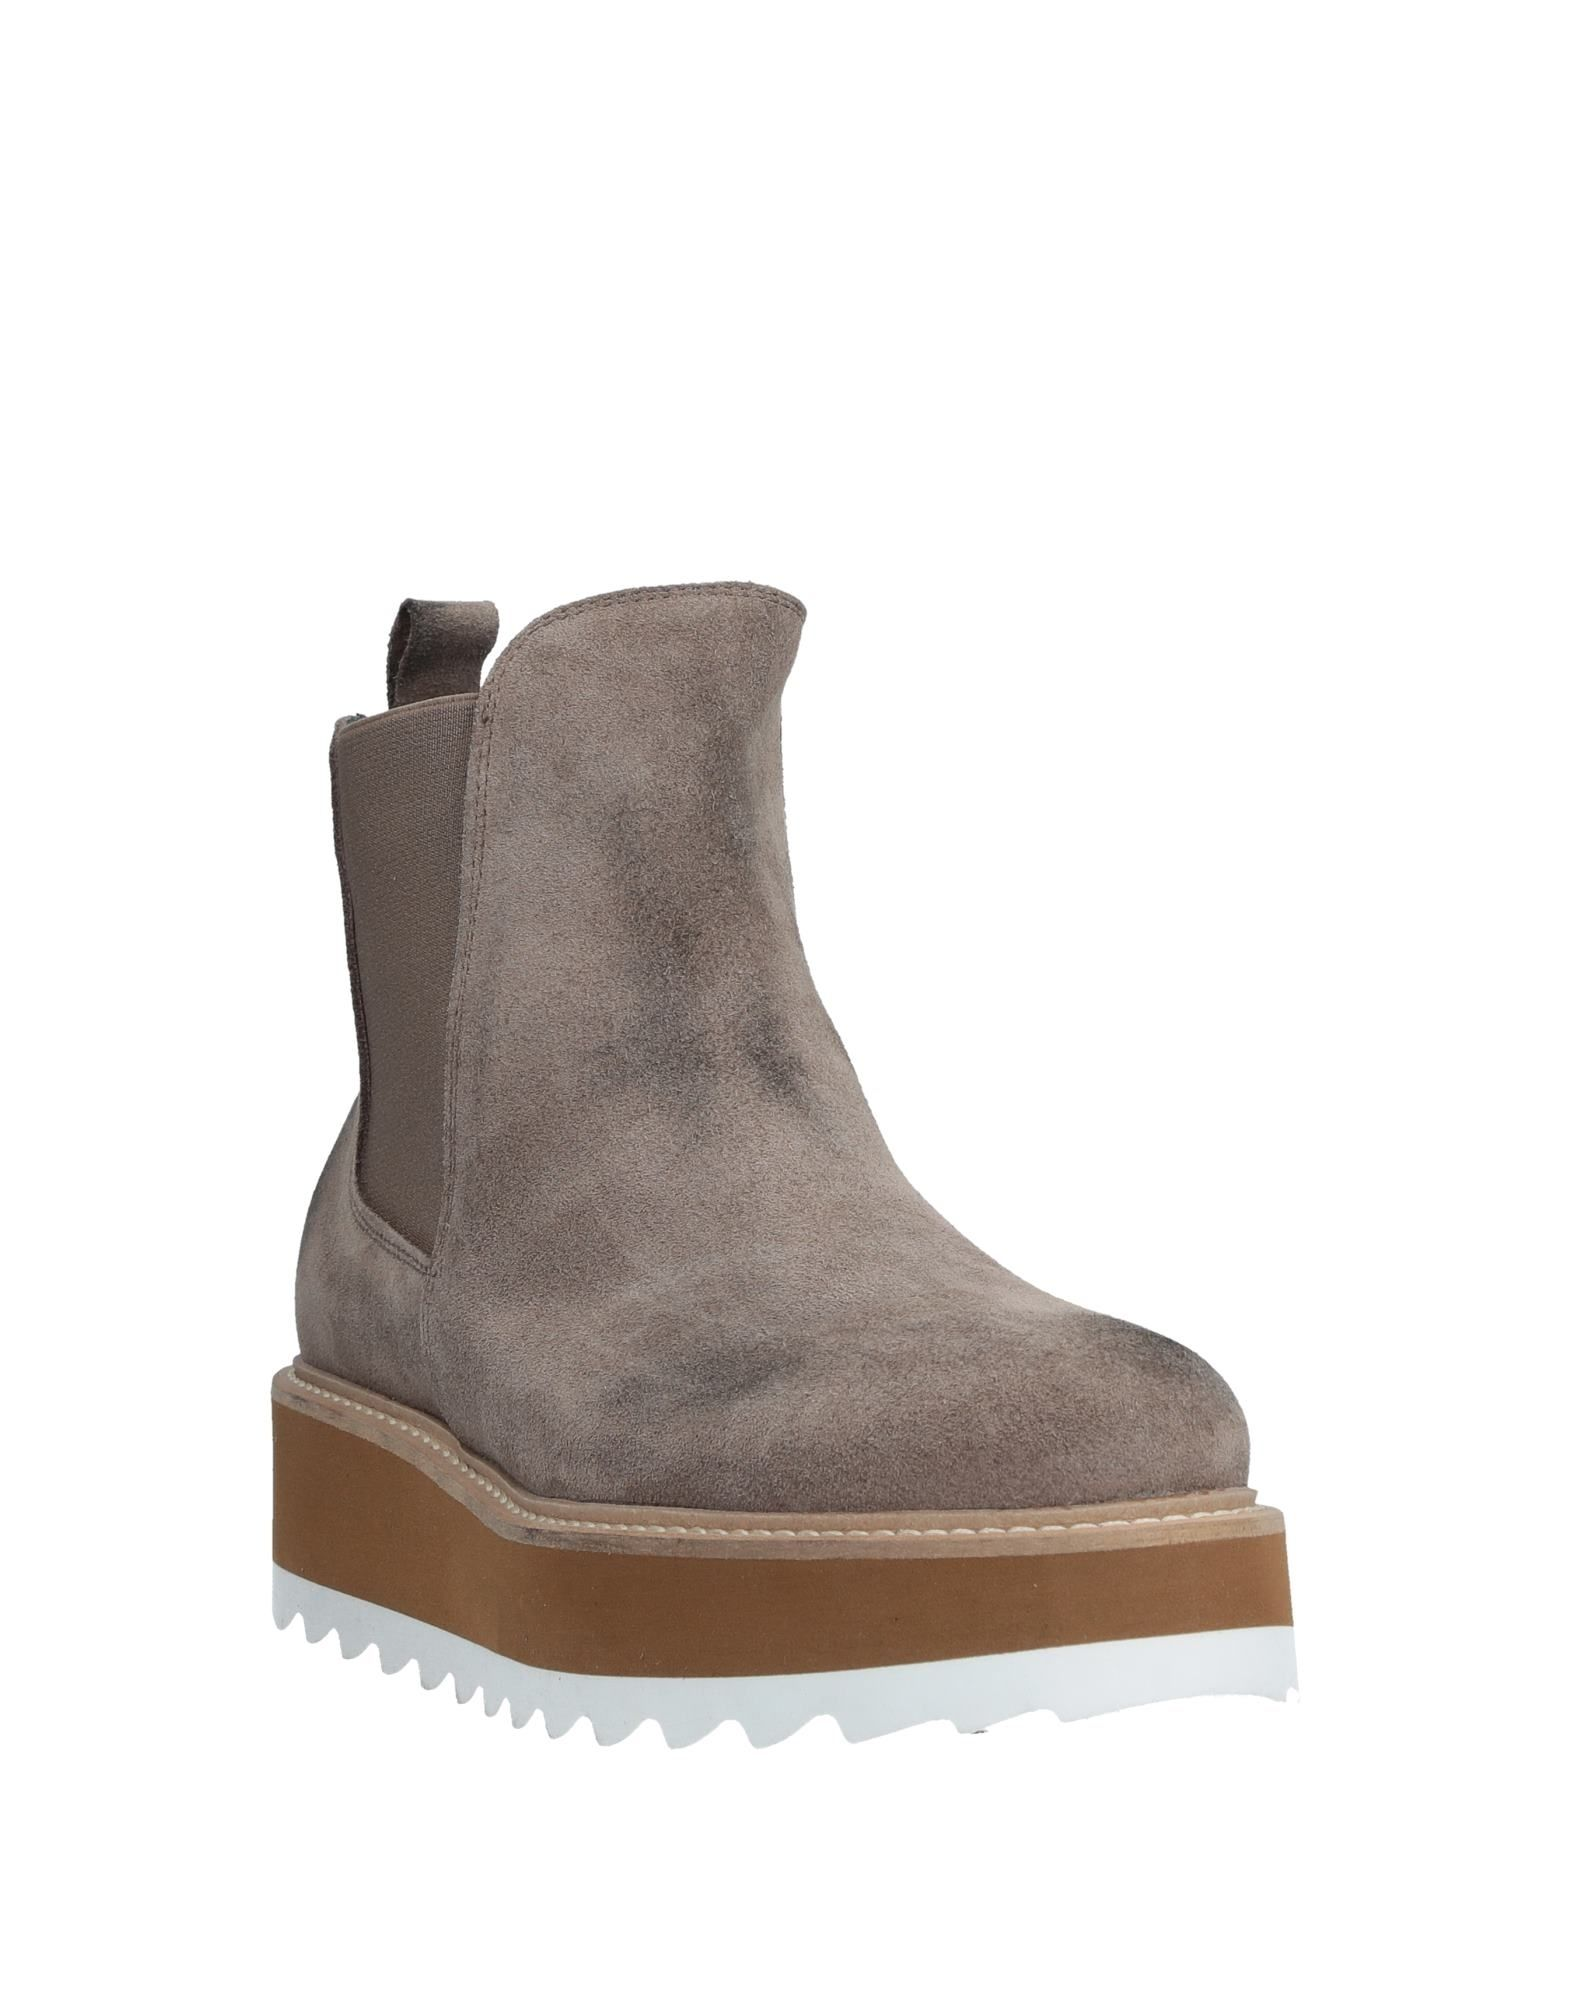 Chiara Luciani Chelsea Stiefel Damen 11537556PM Gute Qualität Schuhe beliebte Schuhe Qualität f4cf9b